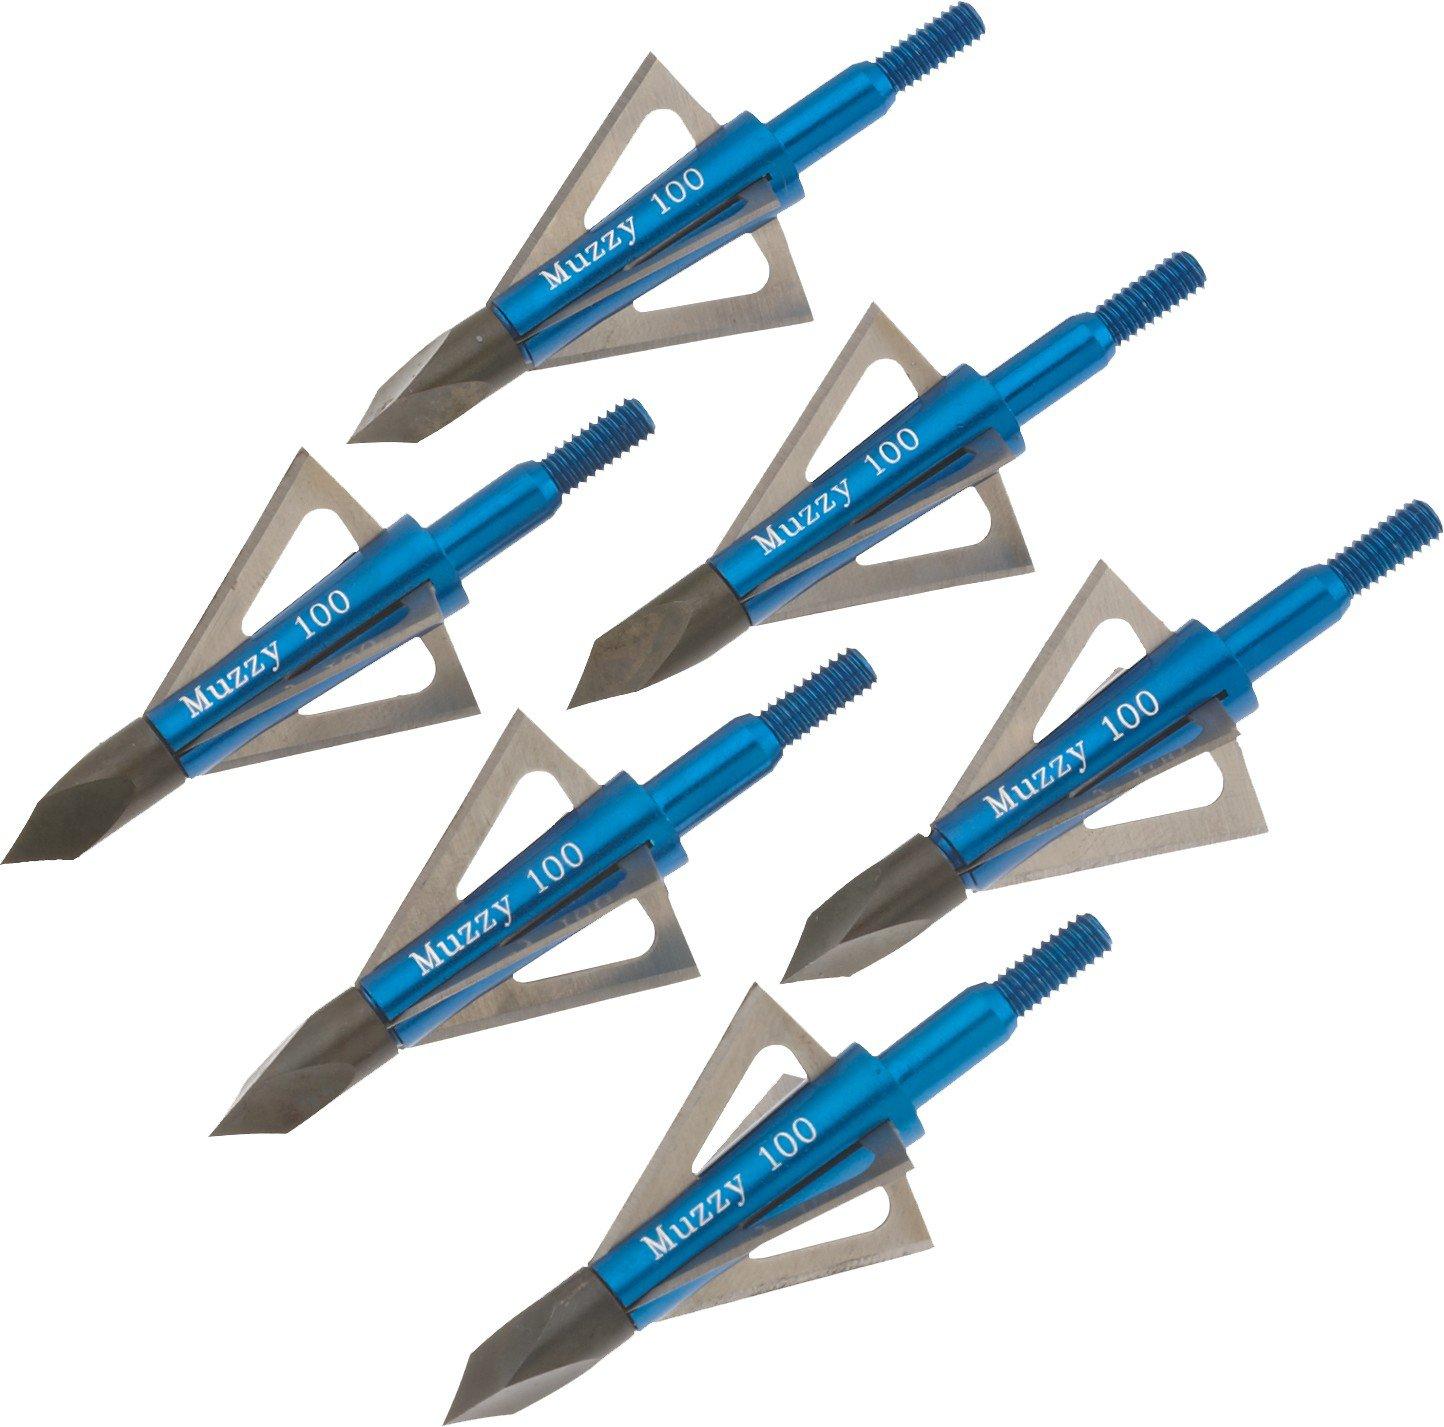 Muzzy 4-Blade Broadheads 6-Pack